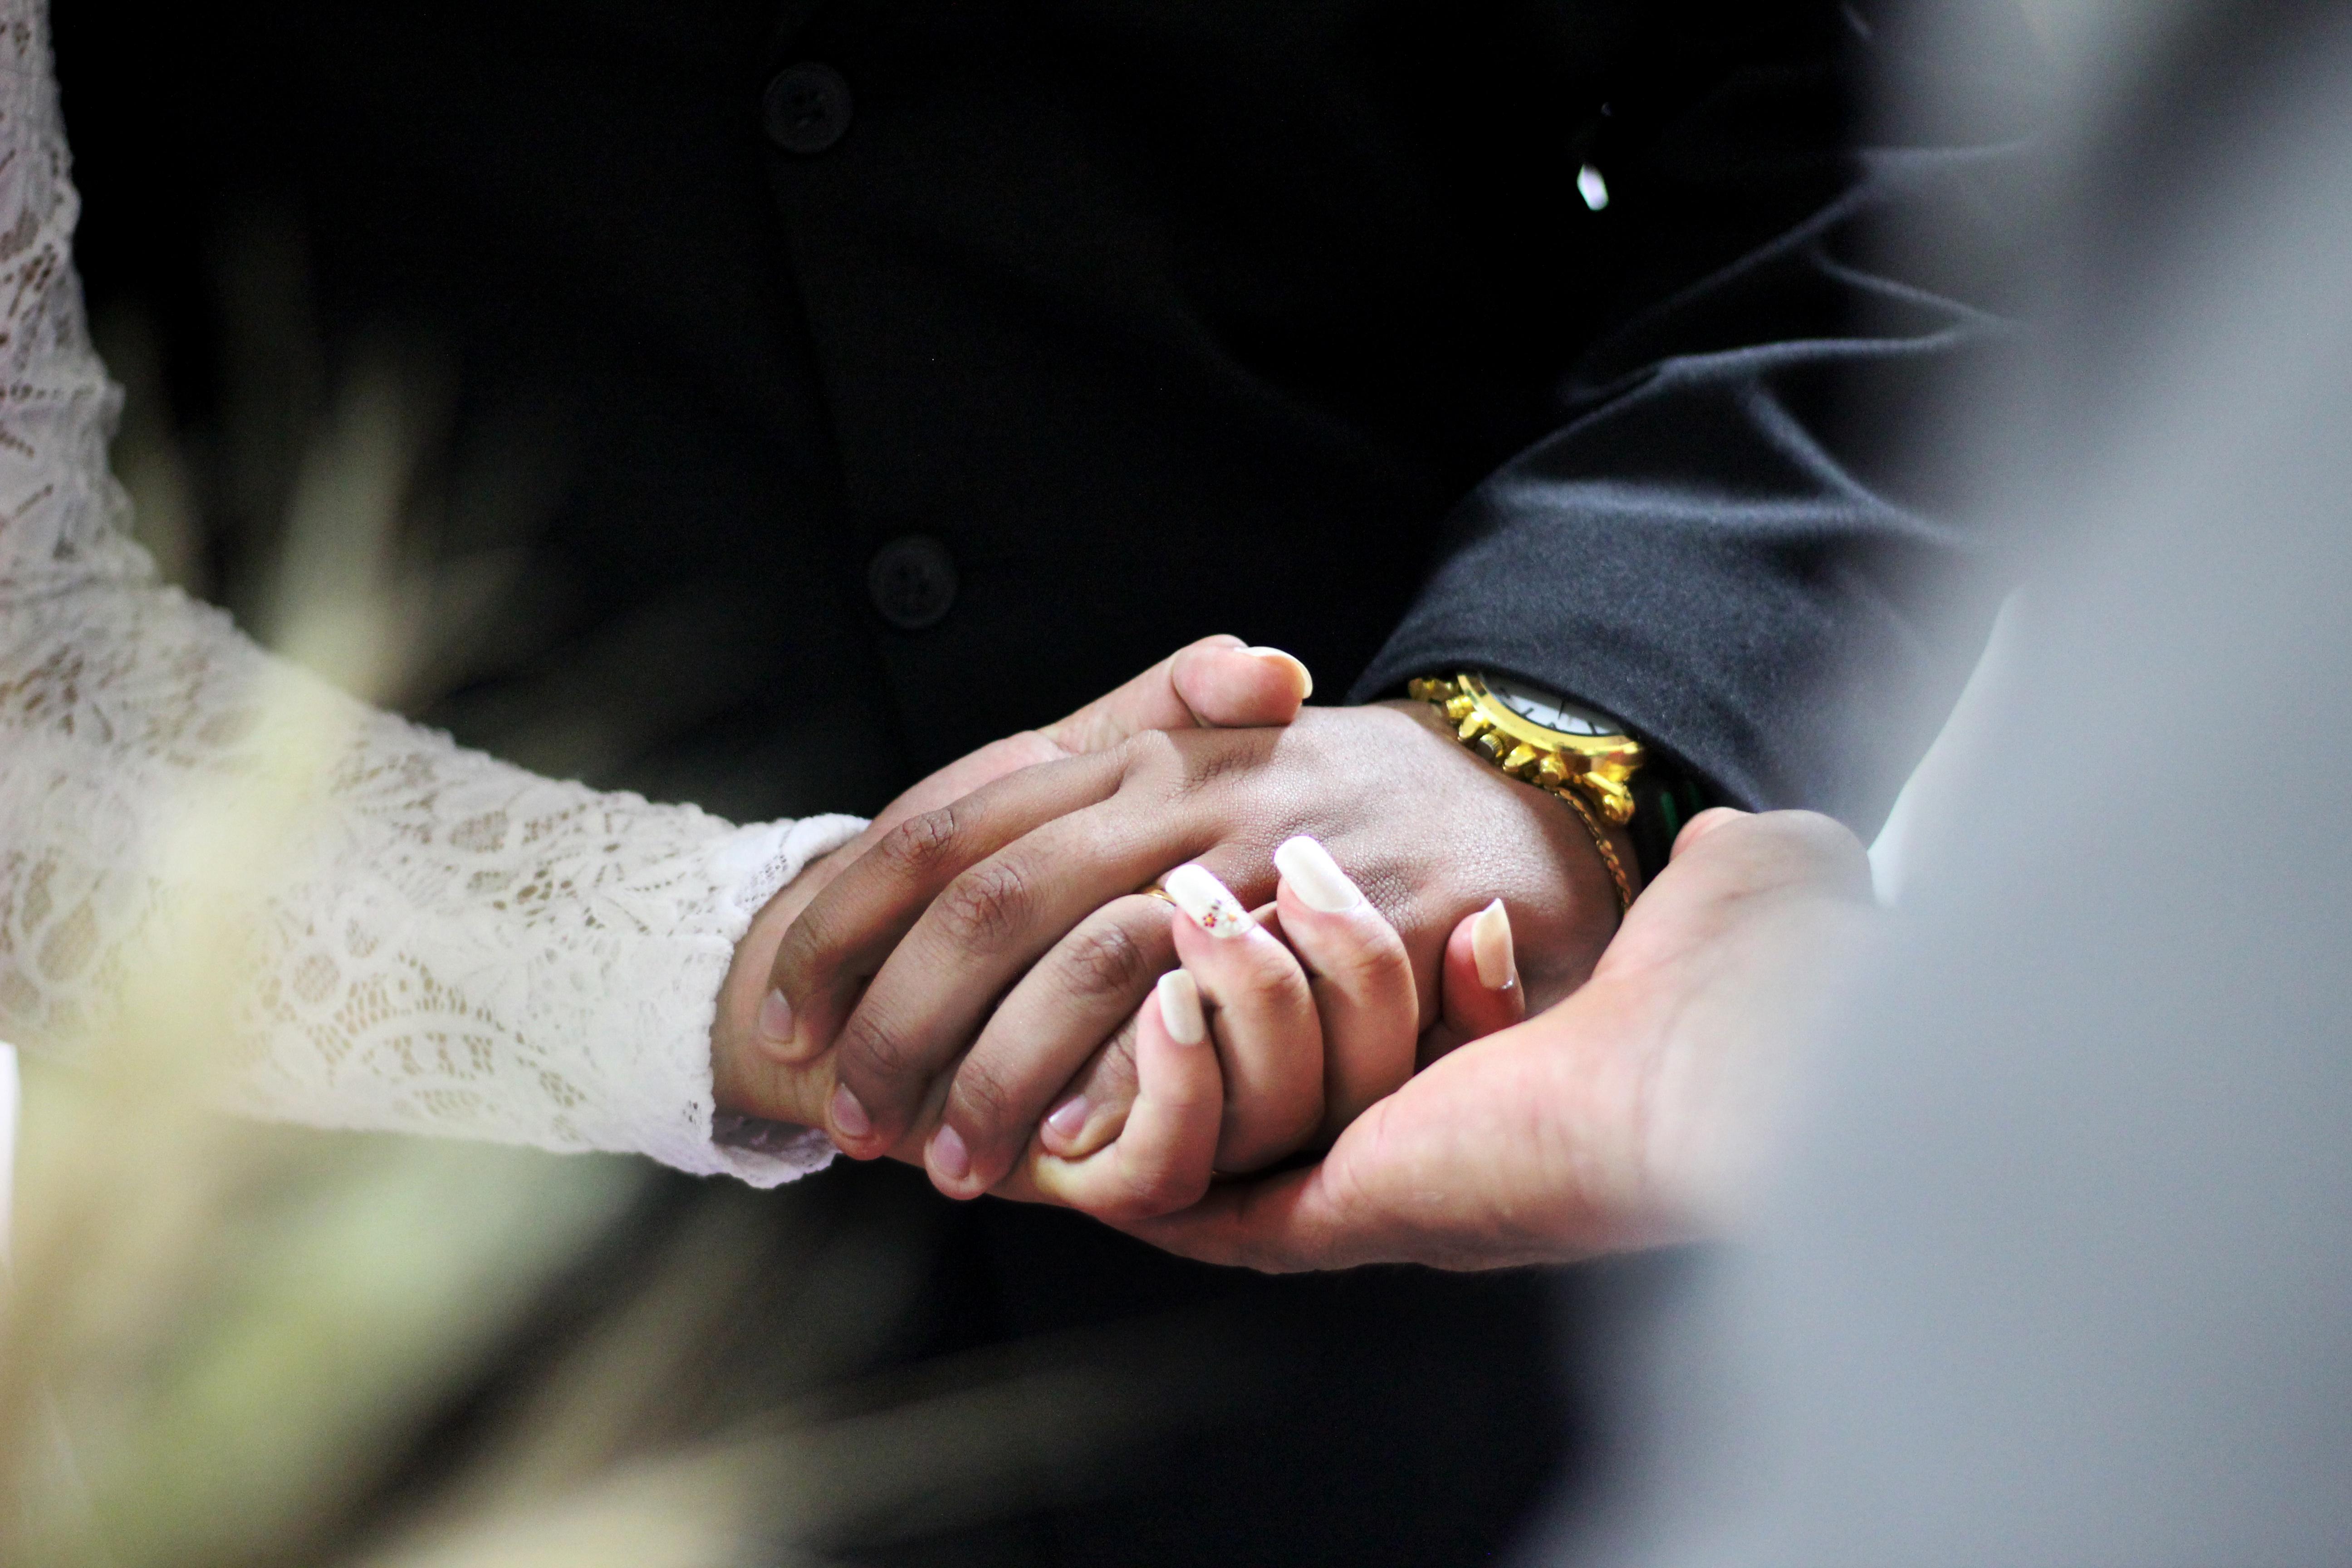 Should you hire a wedding videographer?